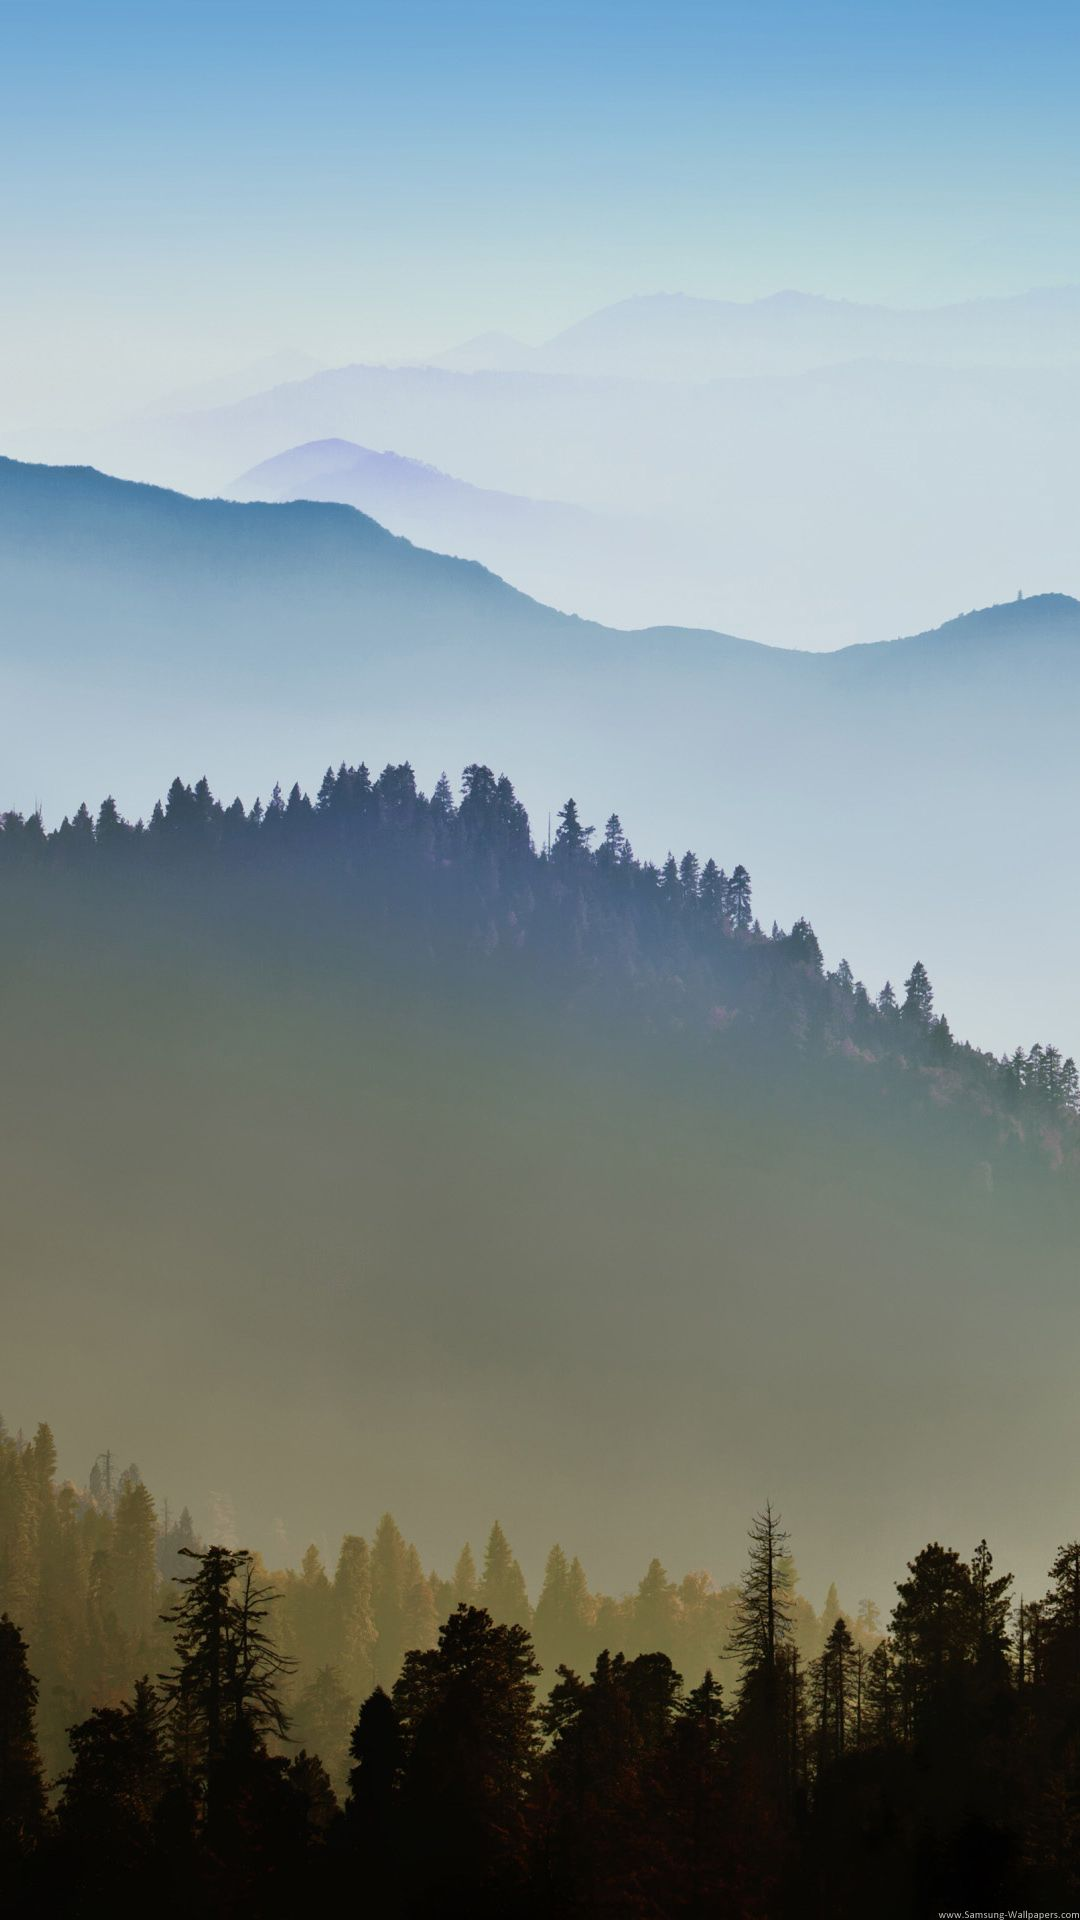 Great Wallpaper Mountain Ipod - 29f08c7cecdaea77b447e8017172d86f  Pictures_885261.jpg